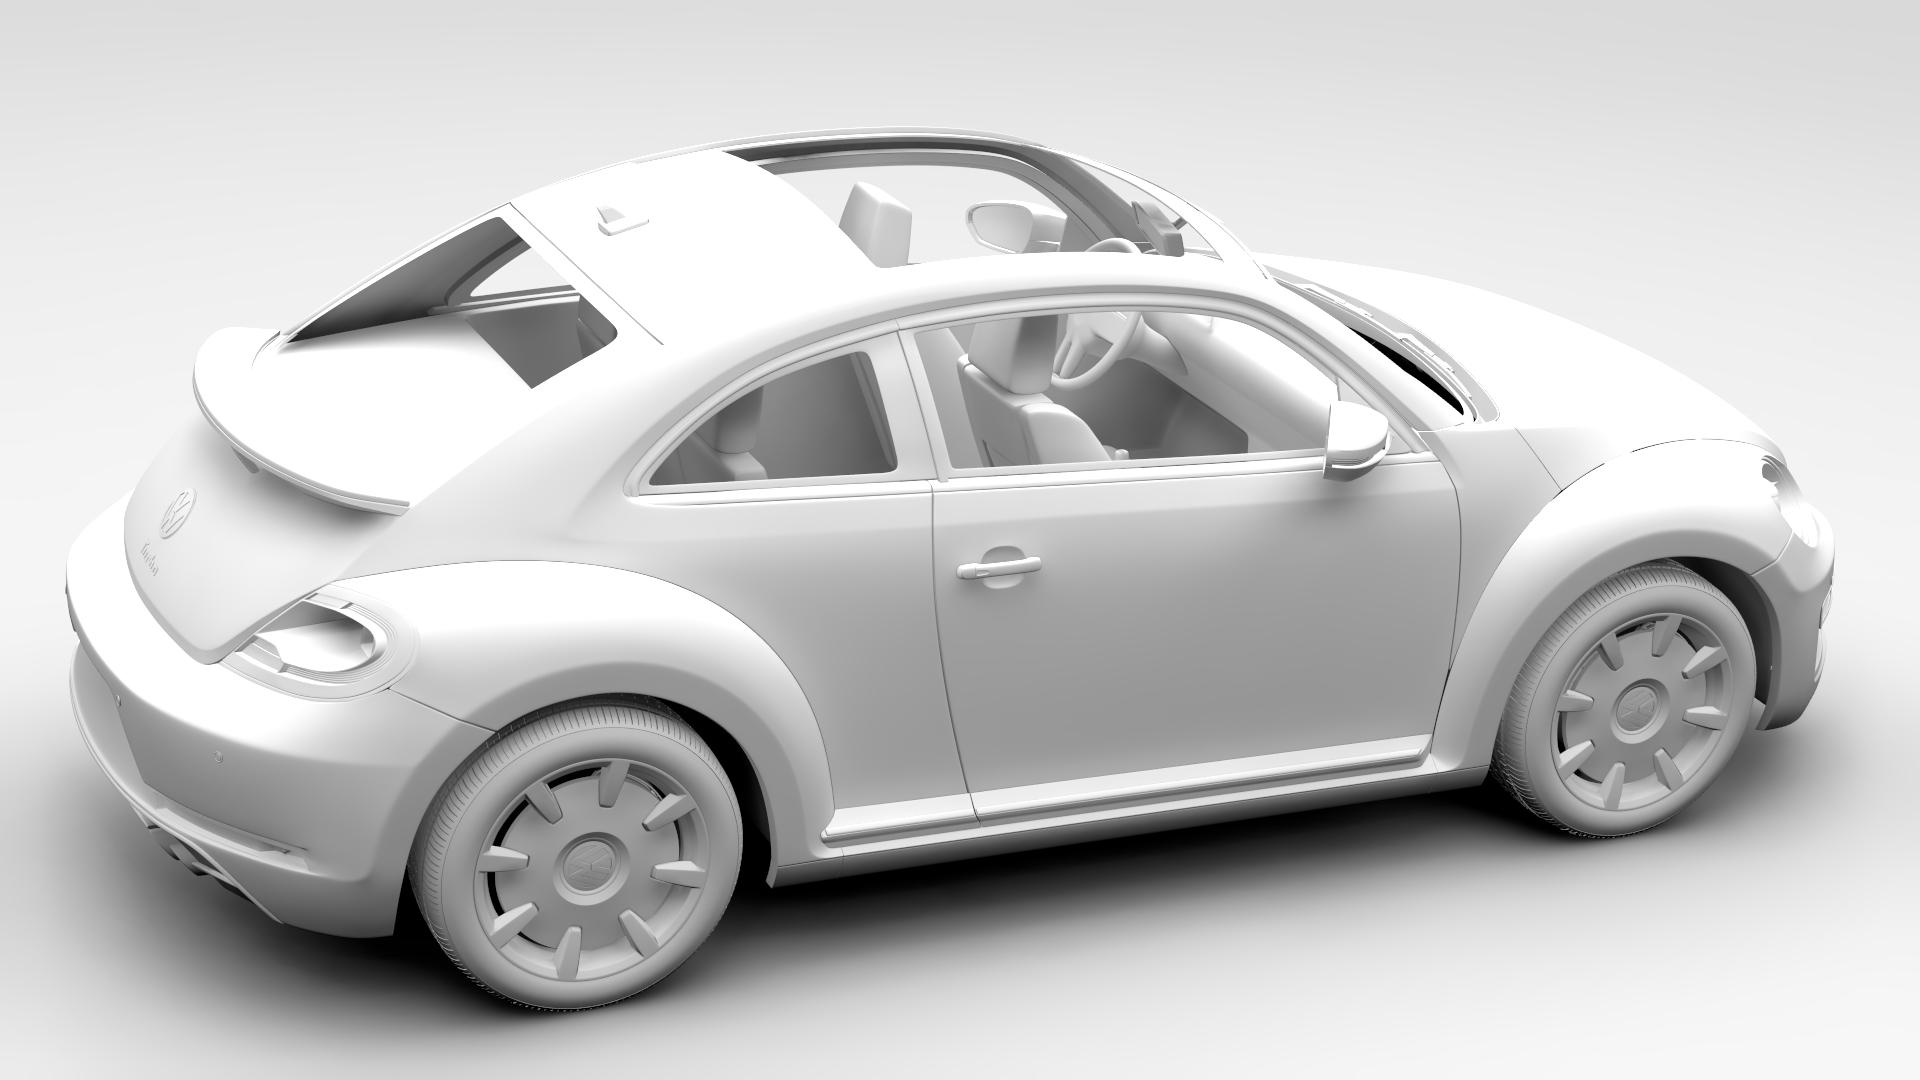 vw beetle turbo 2017 3d model 3ds max fbx c4d lwo ma mb hrc xsi obj 221673